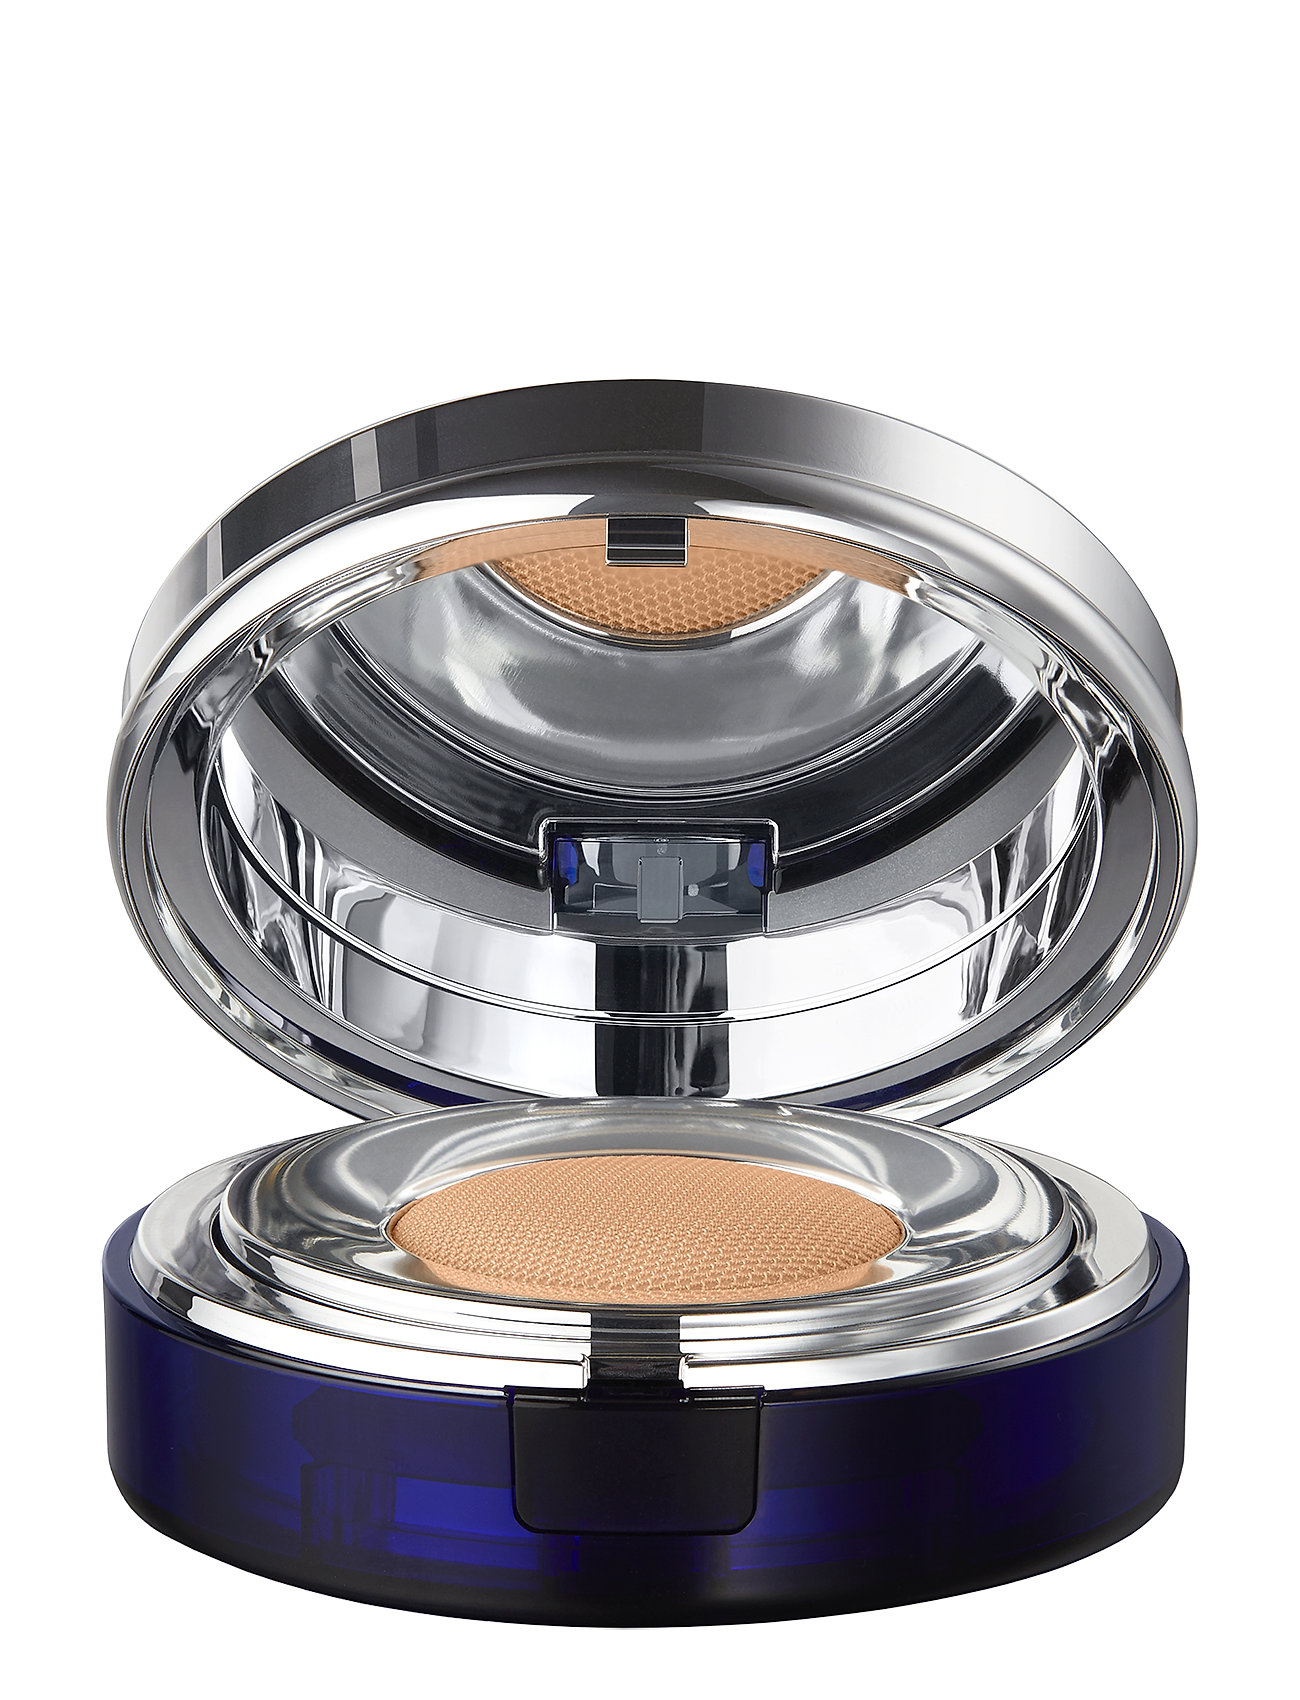 Image of Essence In Foundation Golden Beige Compact Foundation Foundation Makeup La Prairie (3067524567)